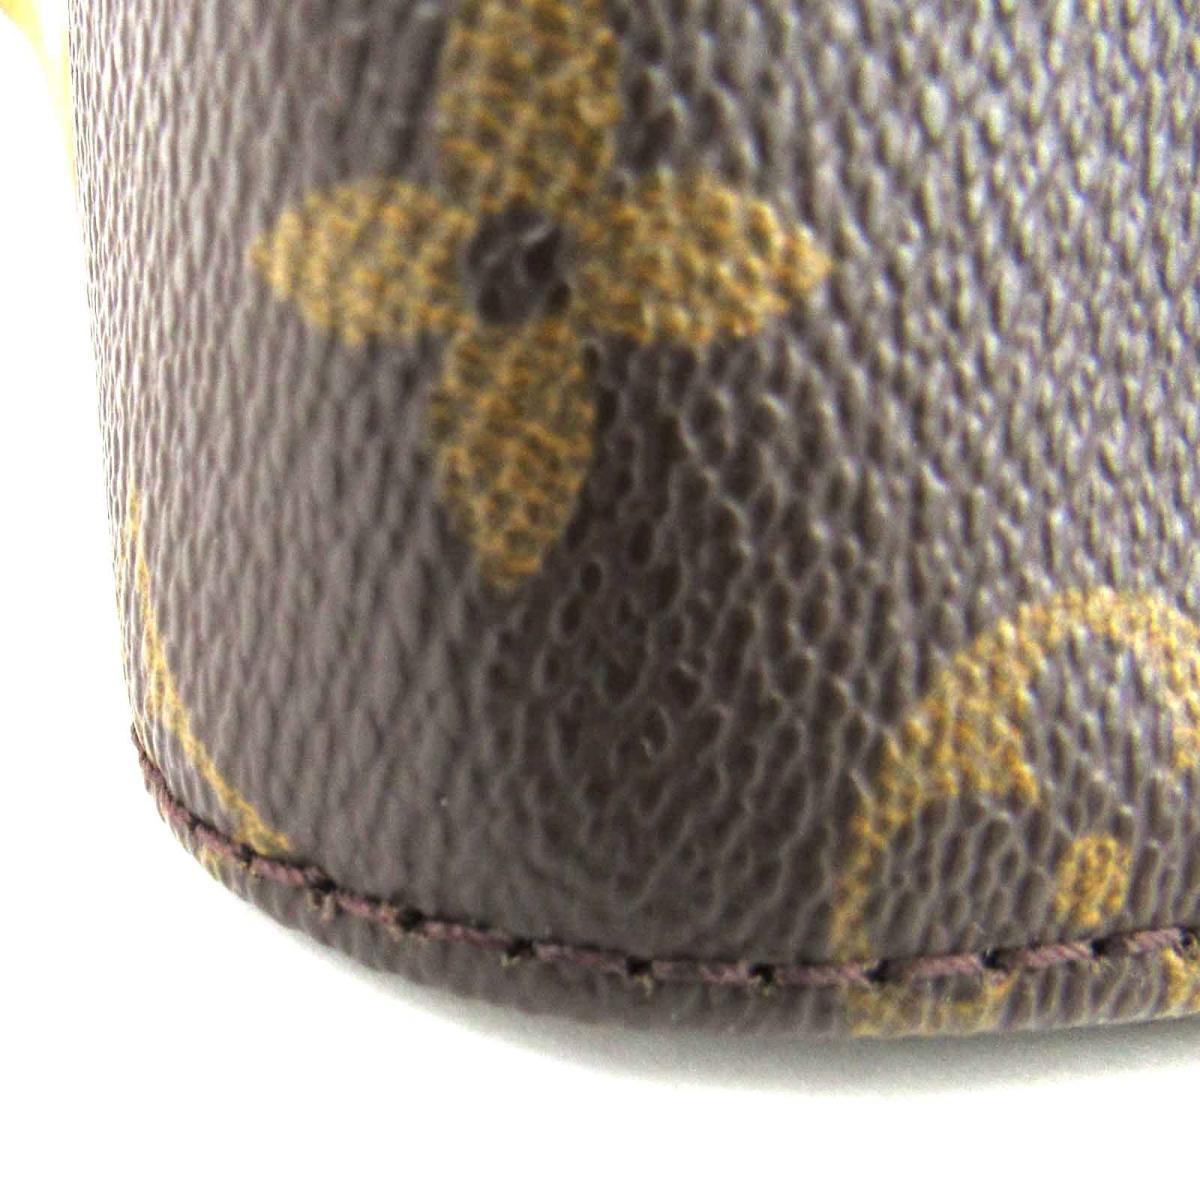 9824651d45cf2 ... Auth LOUIS VUITTON Mini Looping Flap Shoulder Bag Monogram Canvas M51147  | BRANDOFF Ginza/TOKYO ...